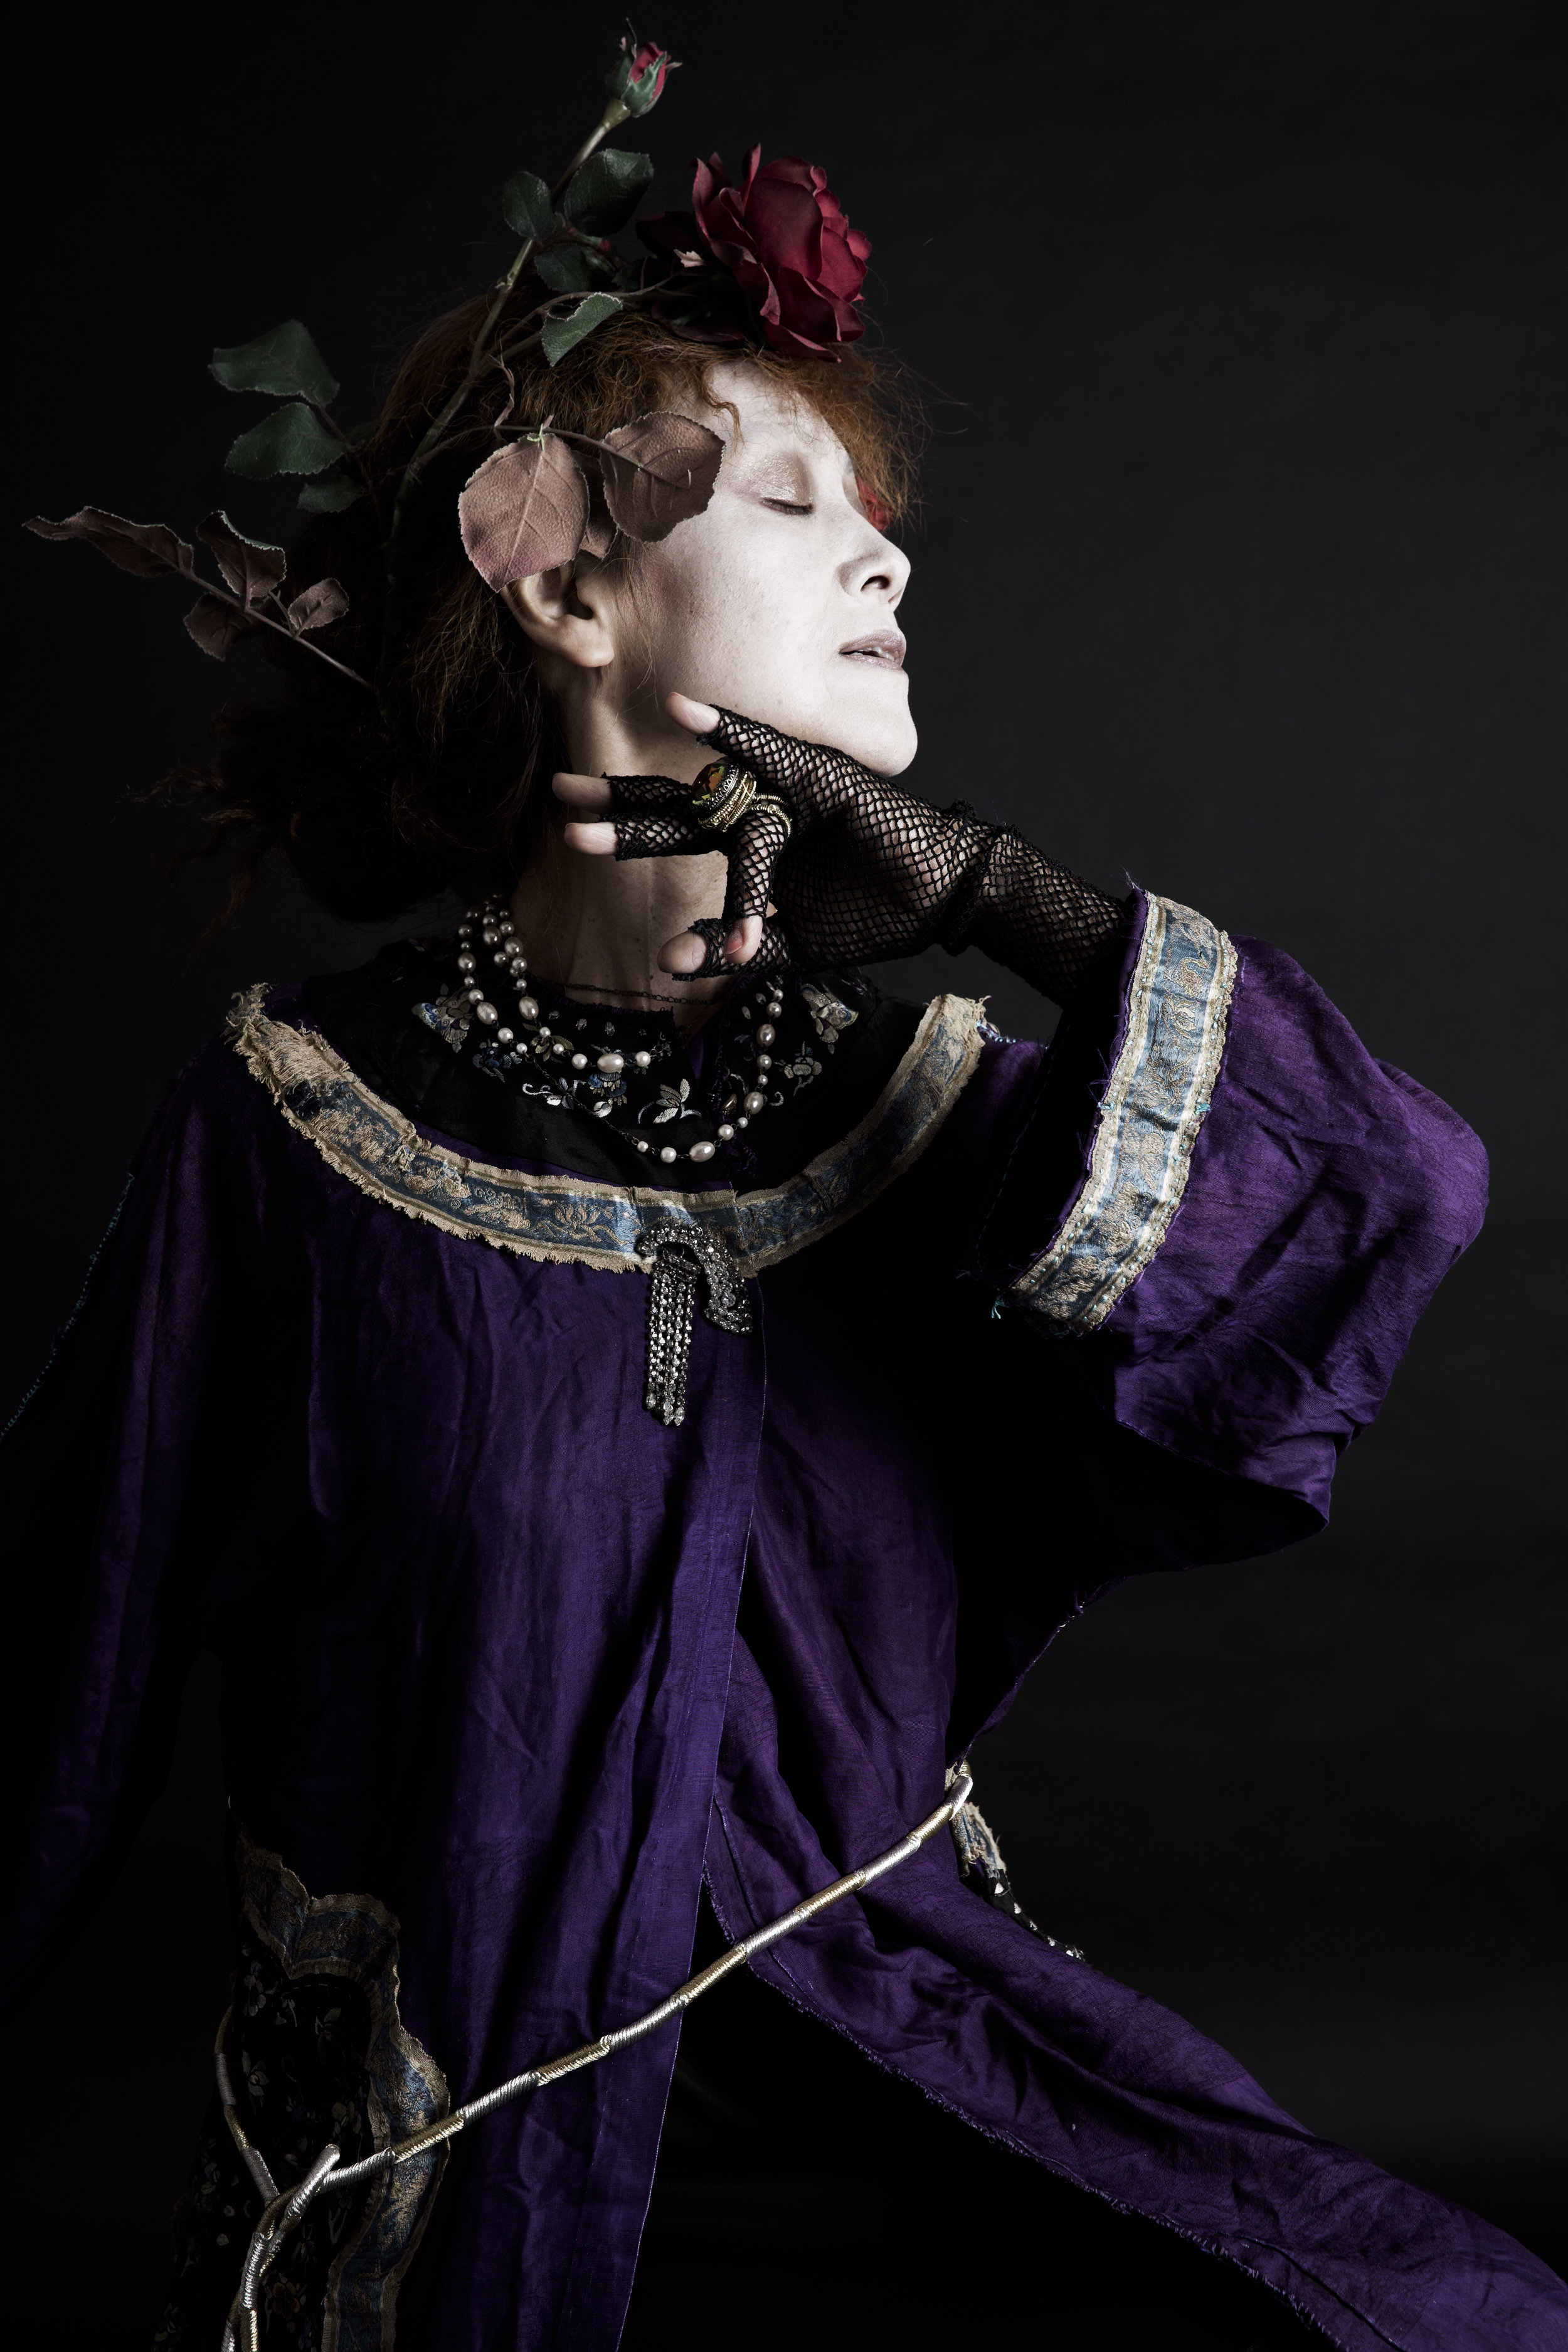 Barae - Love and Dream #5, 2015